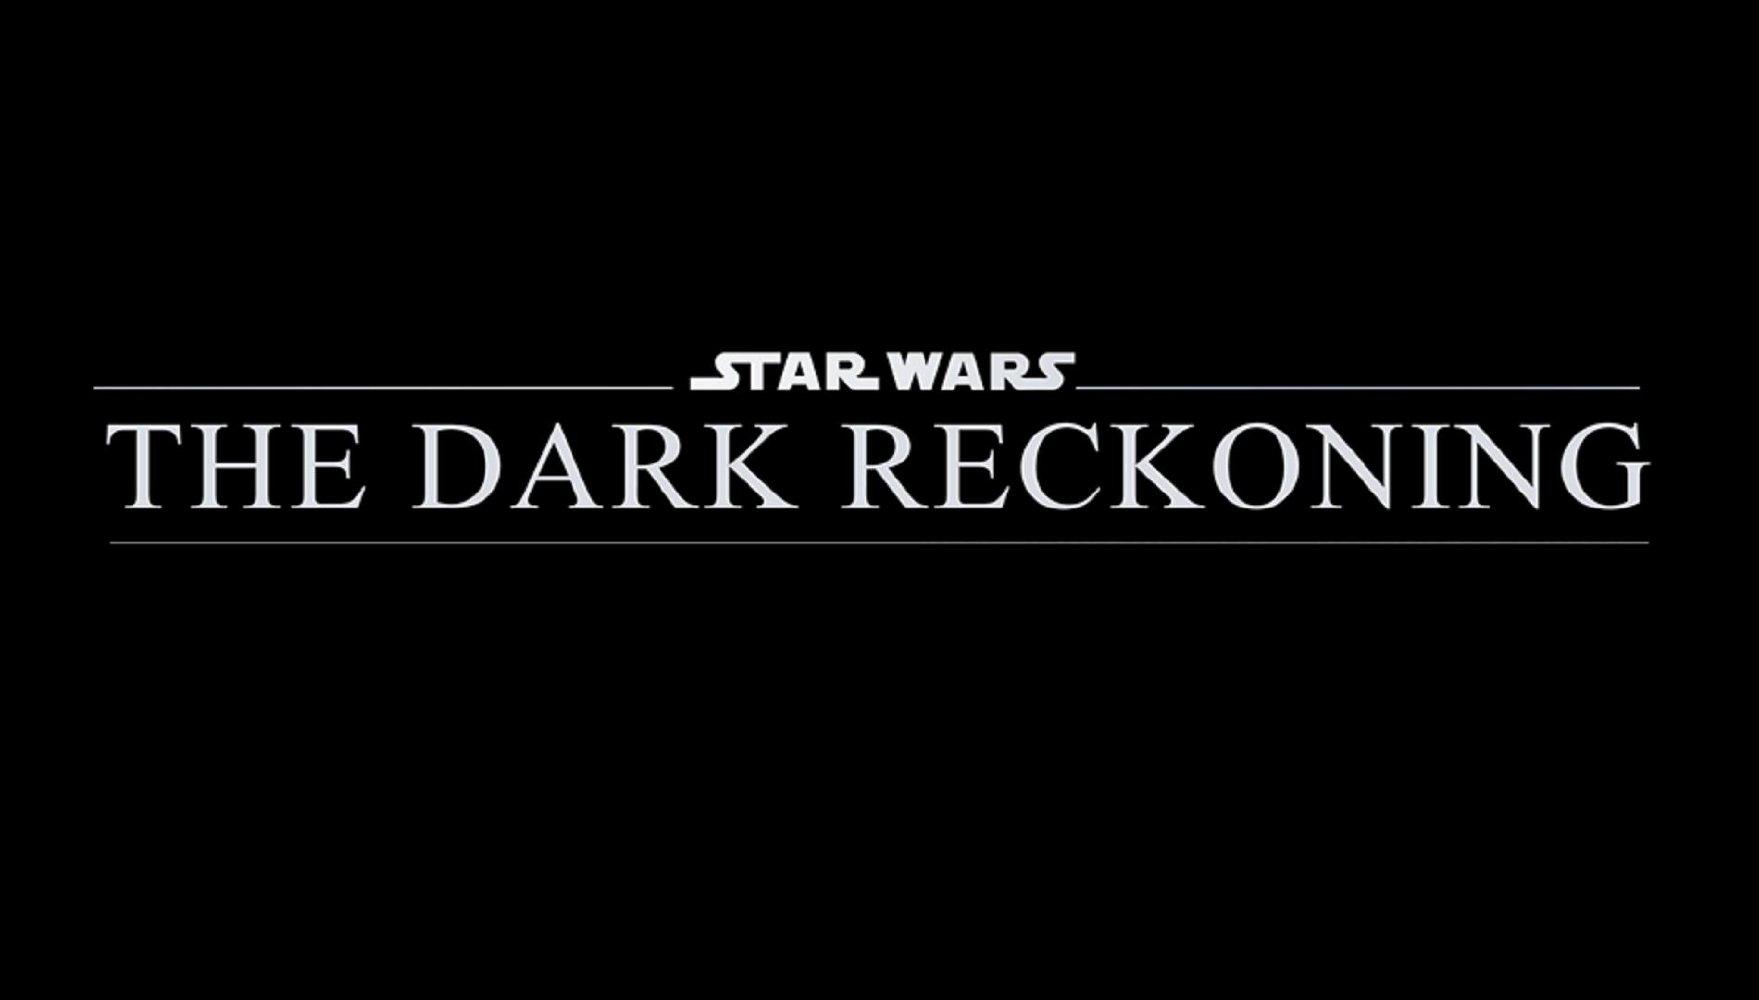 Смотреть трейлер Star Wars: The Dark Reckoning (2017)